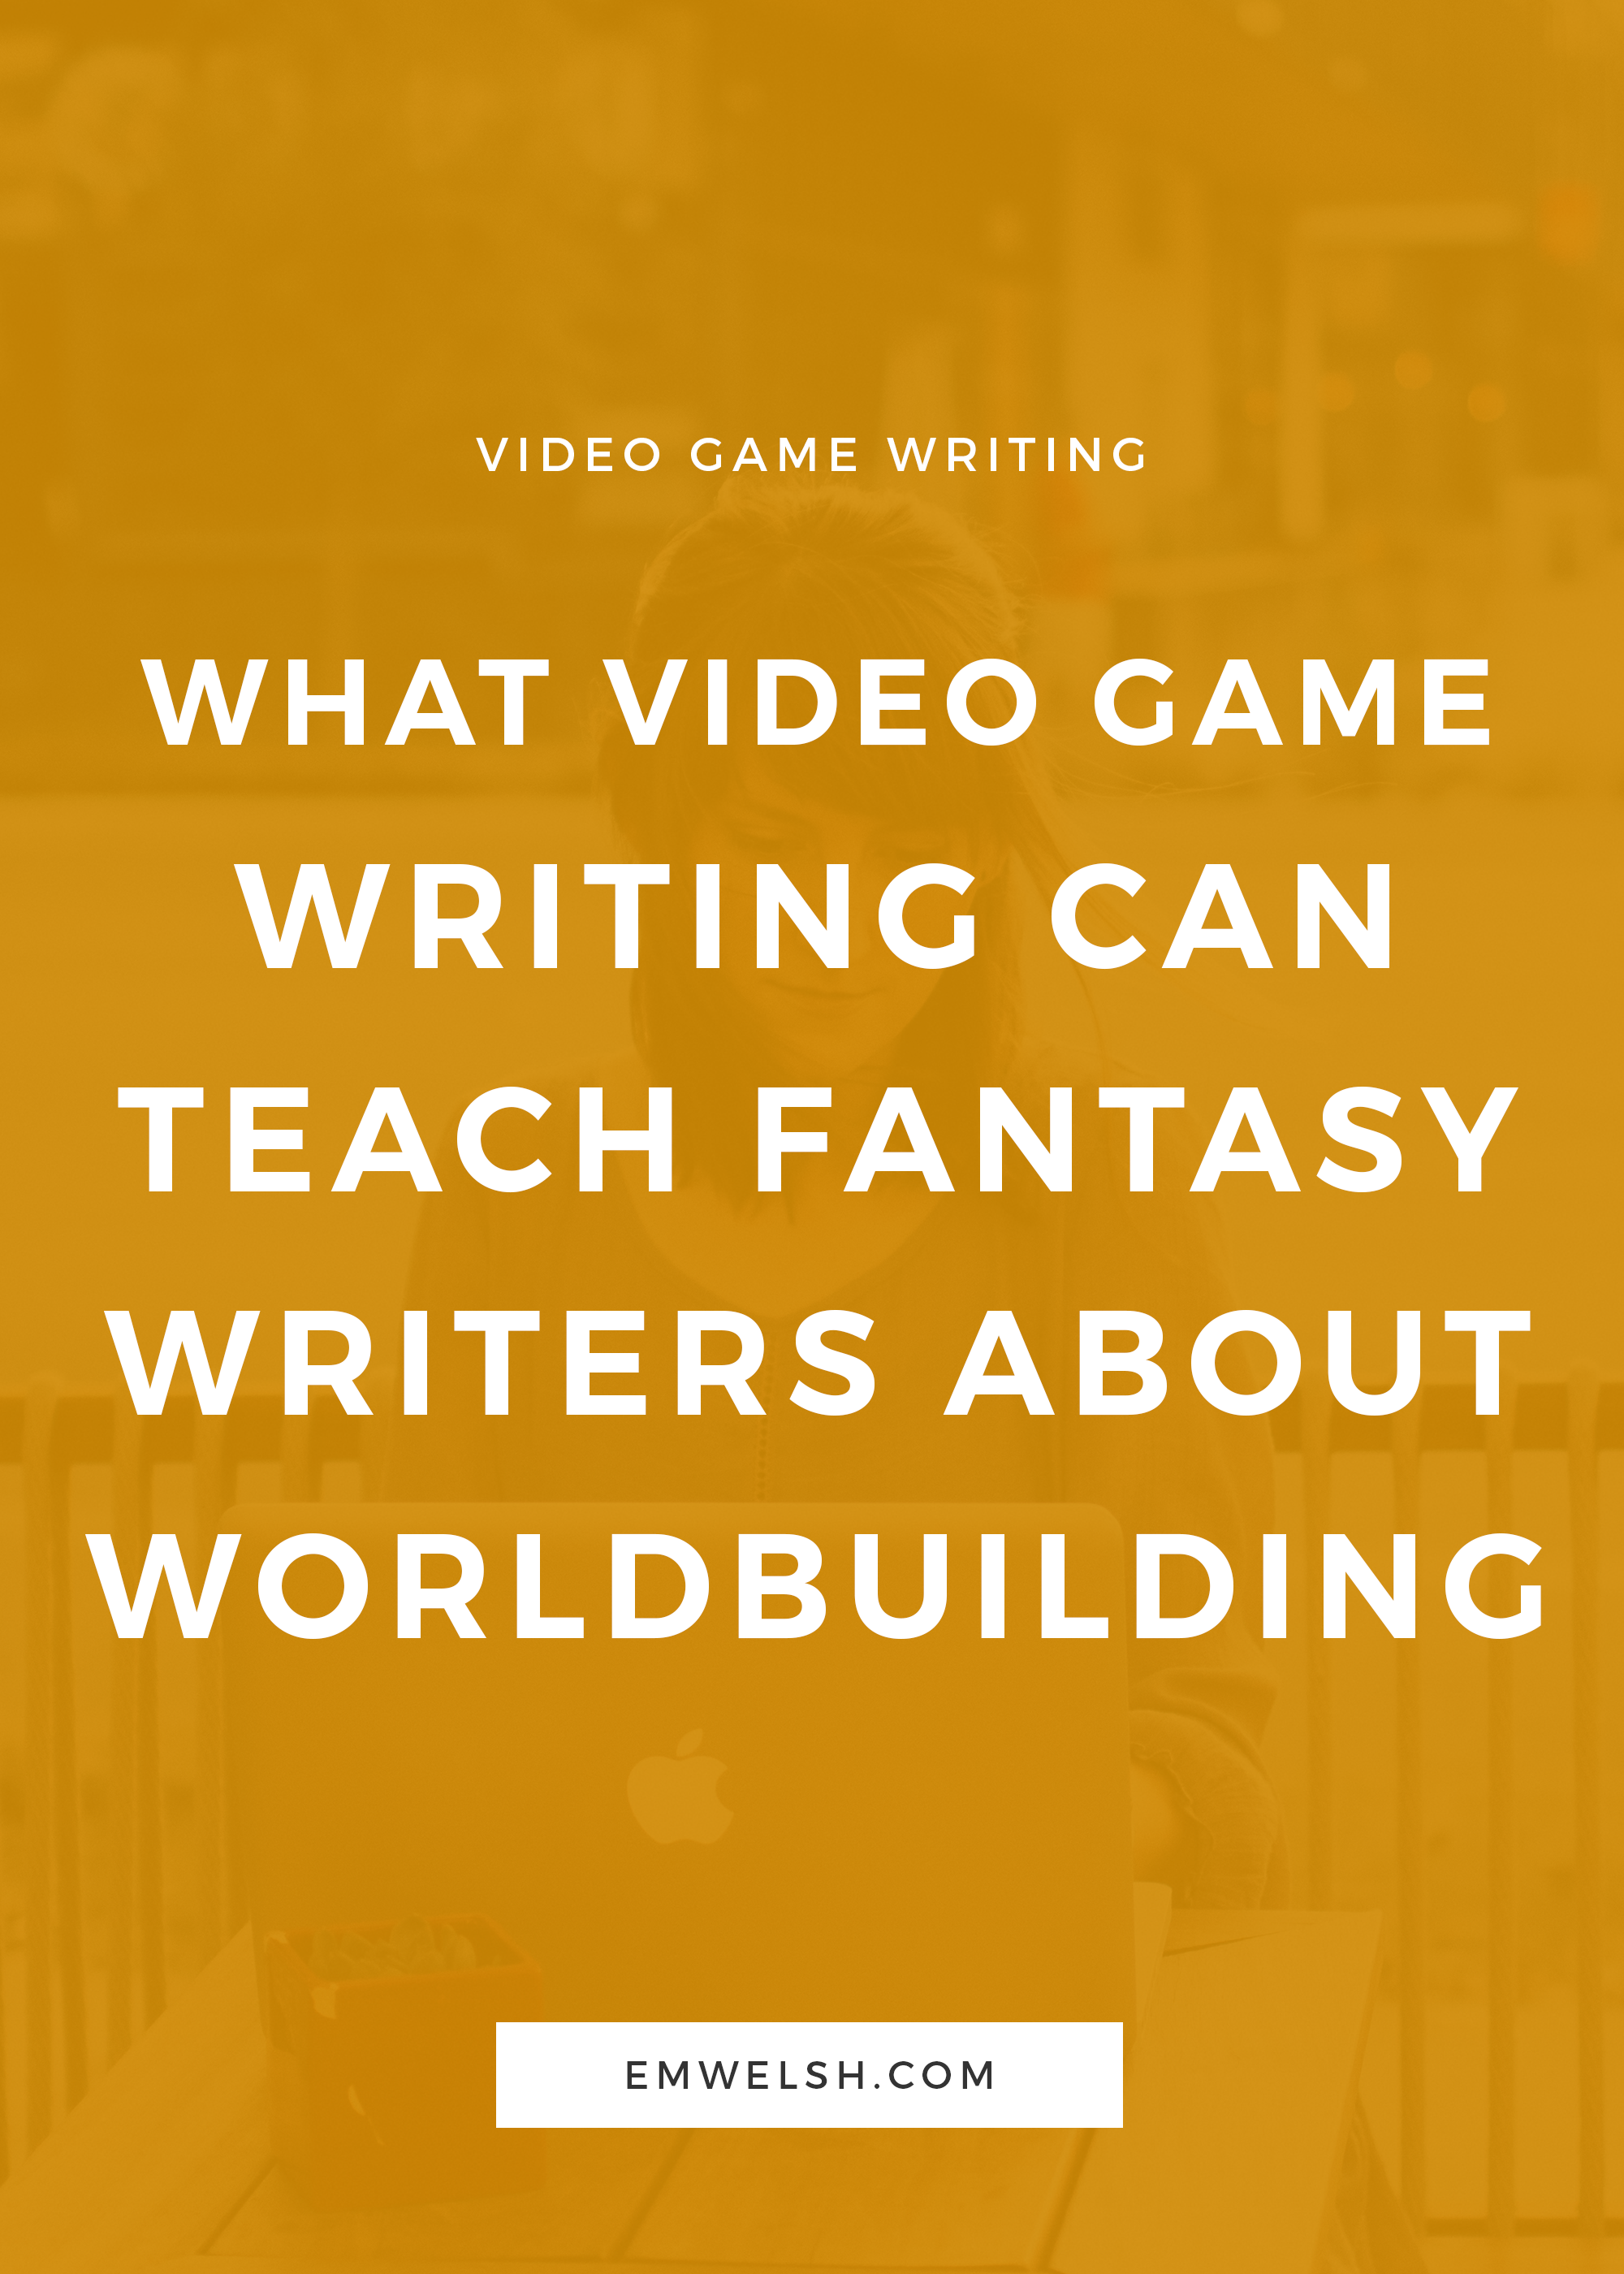 Video_Game_Writing_Fantasy_Writers_Worldbuilding.png